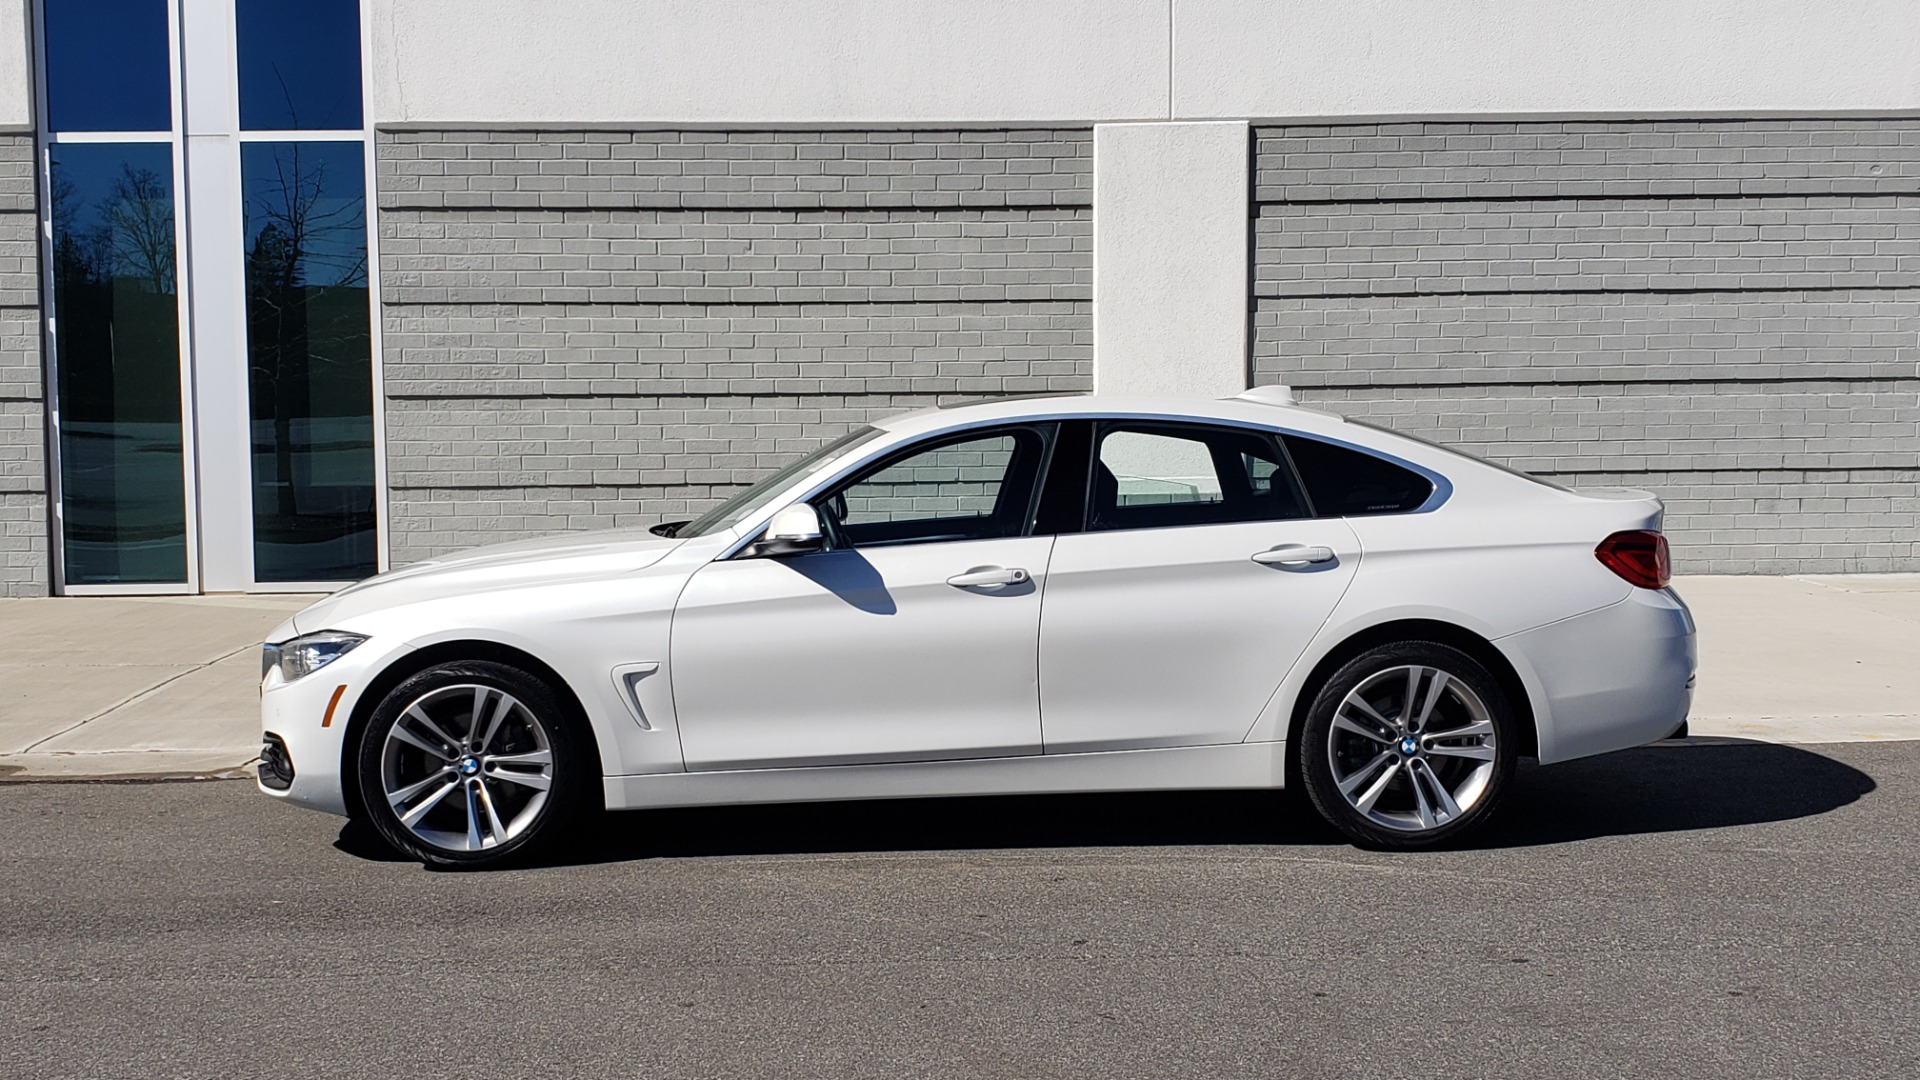 Used 2018 BMW 4 SERIES 430IXDRIVE / PREMIUM / NAV / SUNROOF / ESSENTIALS PKG for sale $28,995 at Formula Imports in Charlotte NC 28227 3